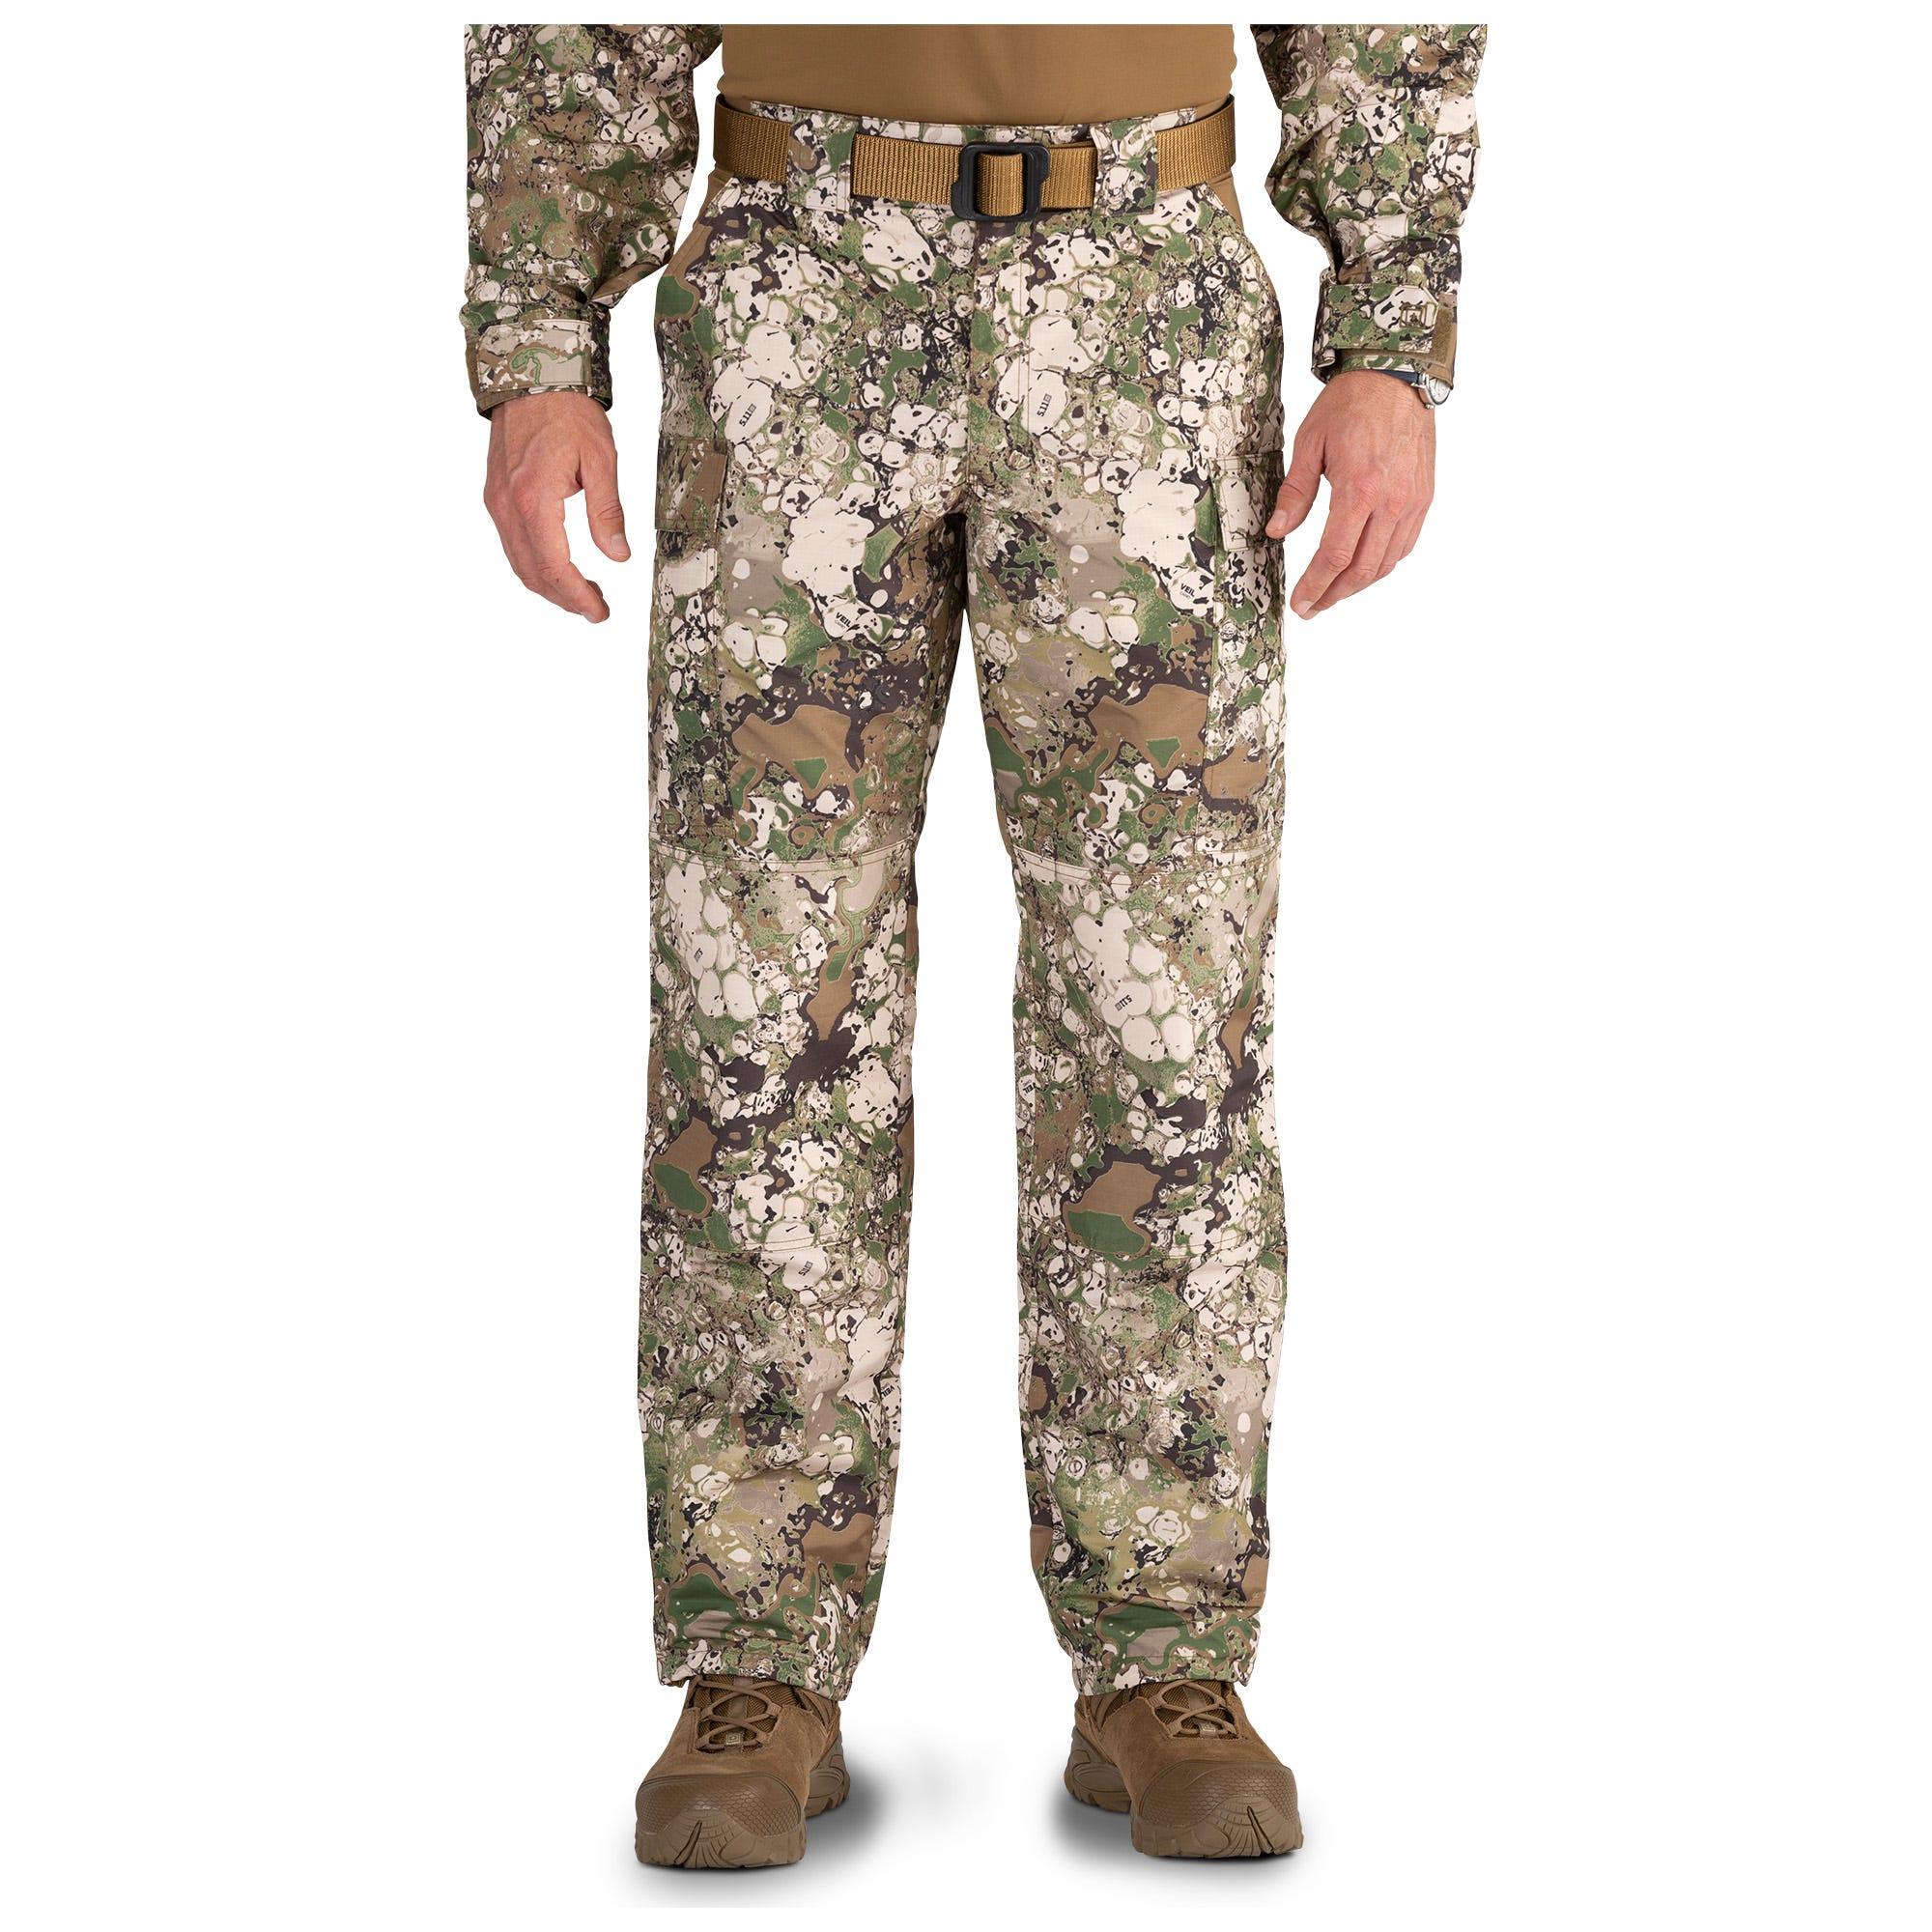 5.11 Tactical Men's GEO7 Fast-tac TDU Pant thumbnail